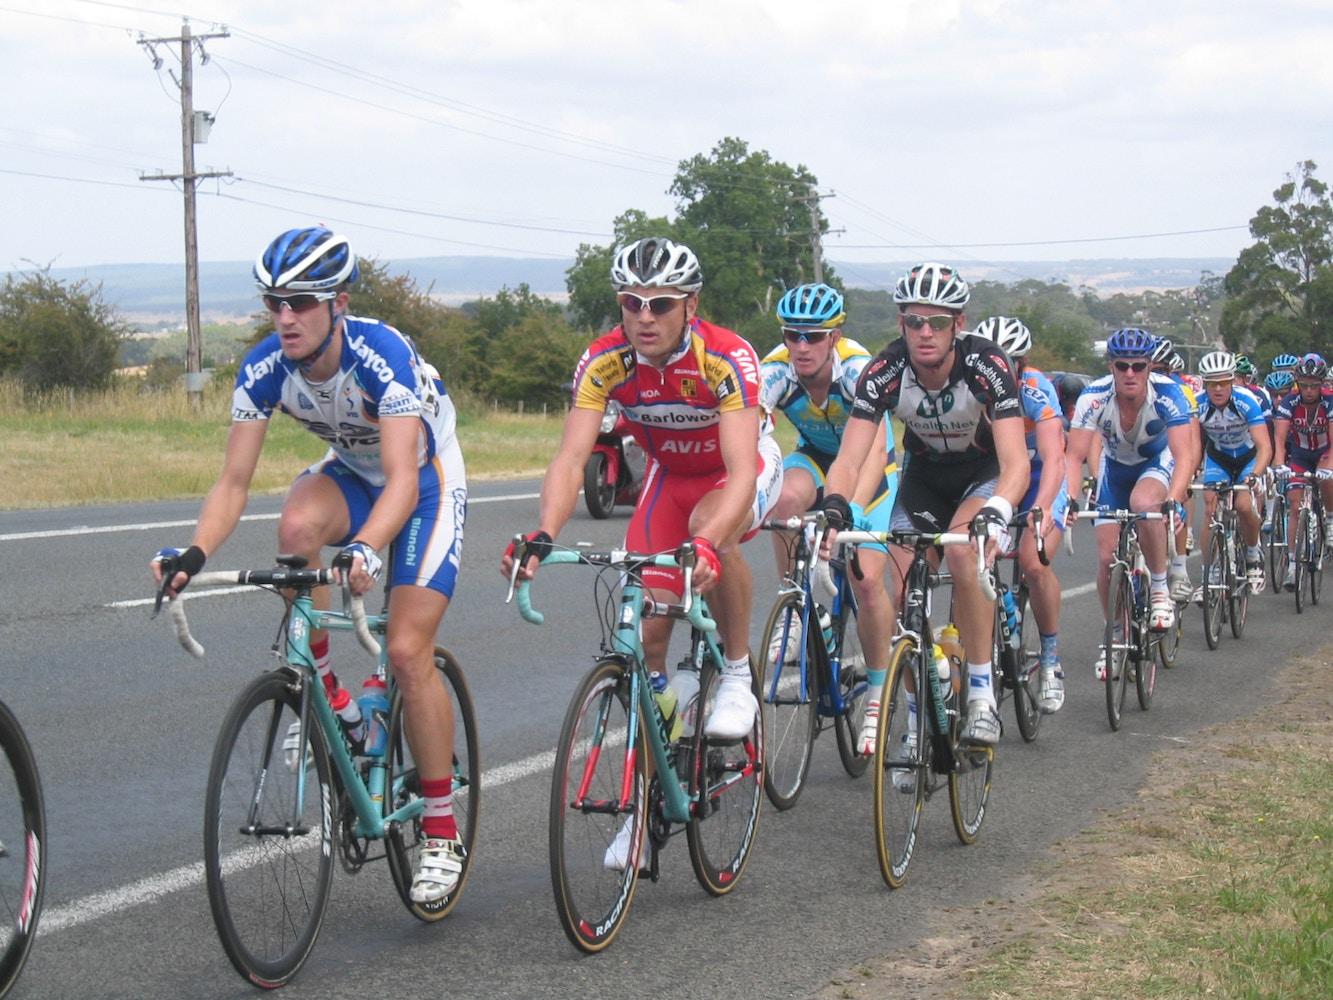 Congratulations to 2008 Australian Road Champion Matthew Lloyd!